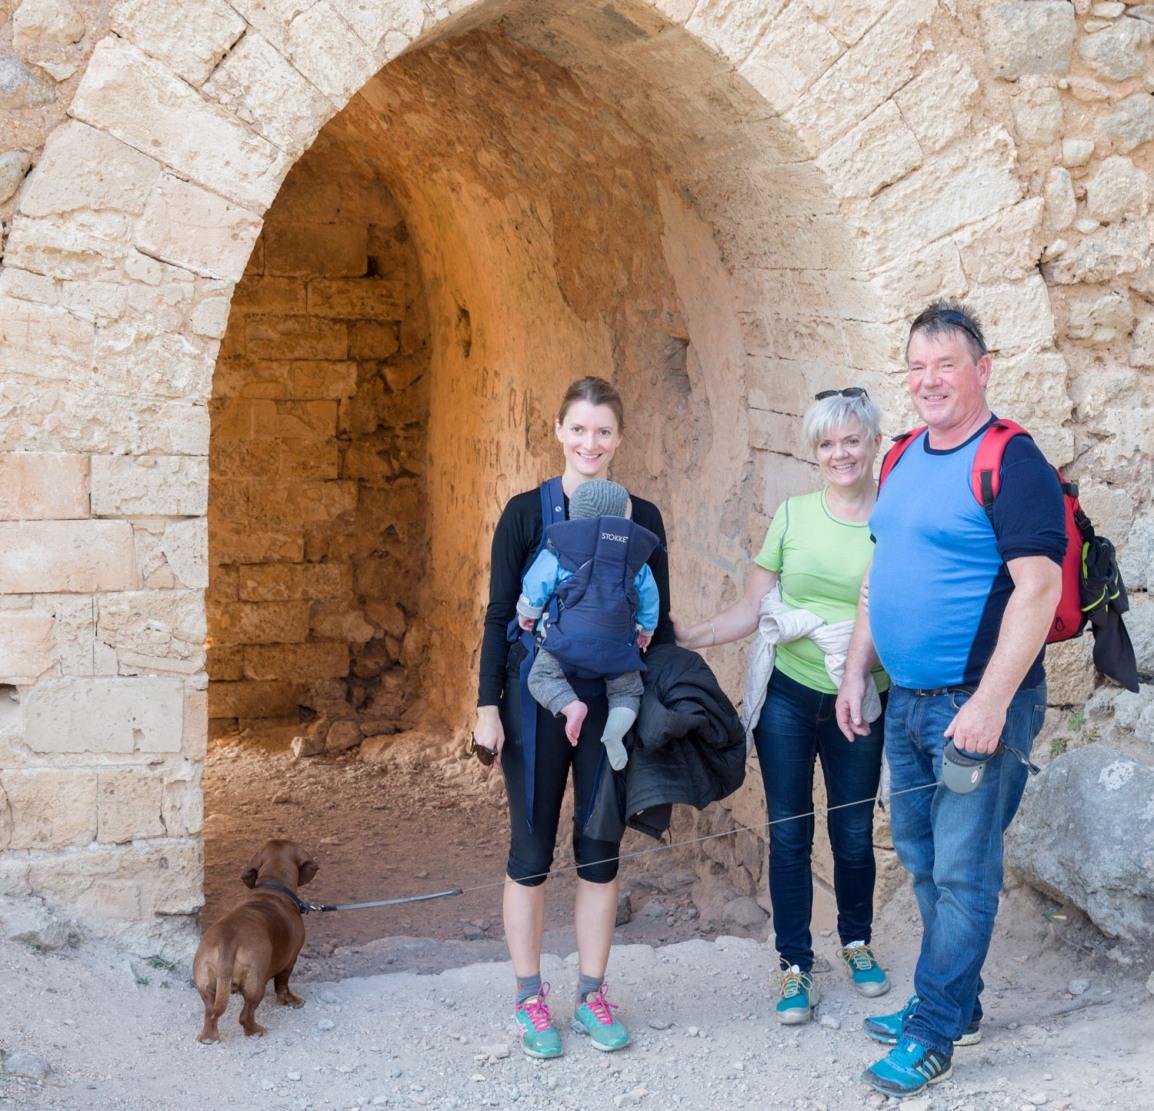 Triallan - Allan Hovda - Mallorca - Terrengløp - Fjelltur - Hiking-21